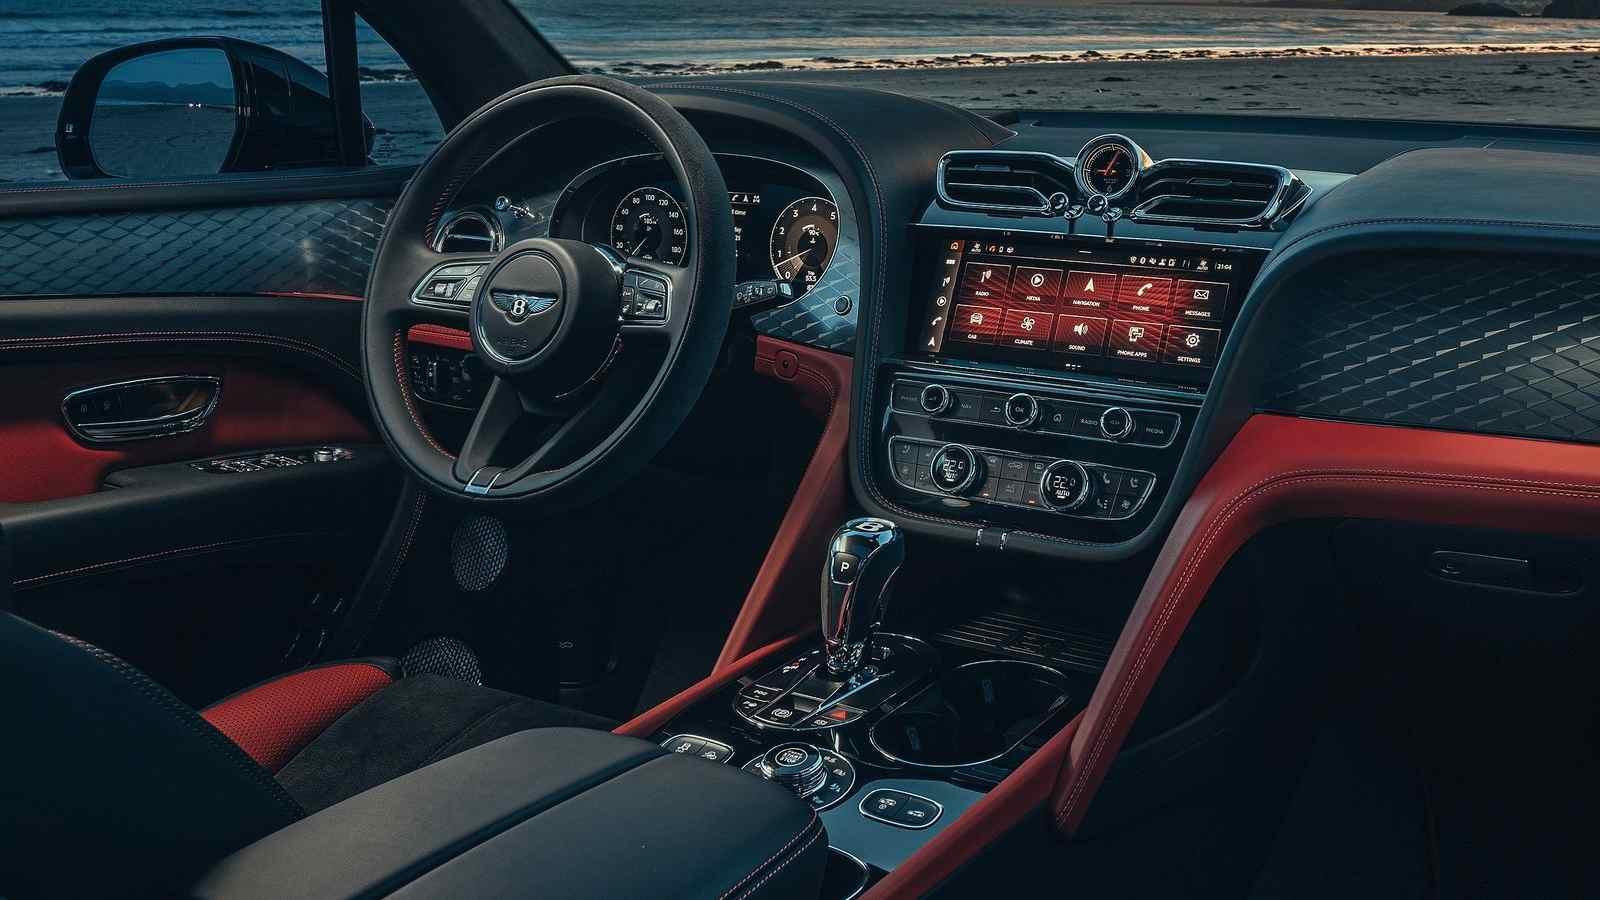 The Bentley Bentayga S' interior features swathes of alcantara. Image: Bentley